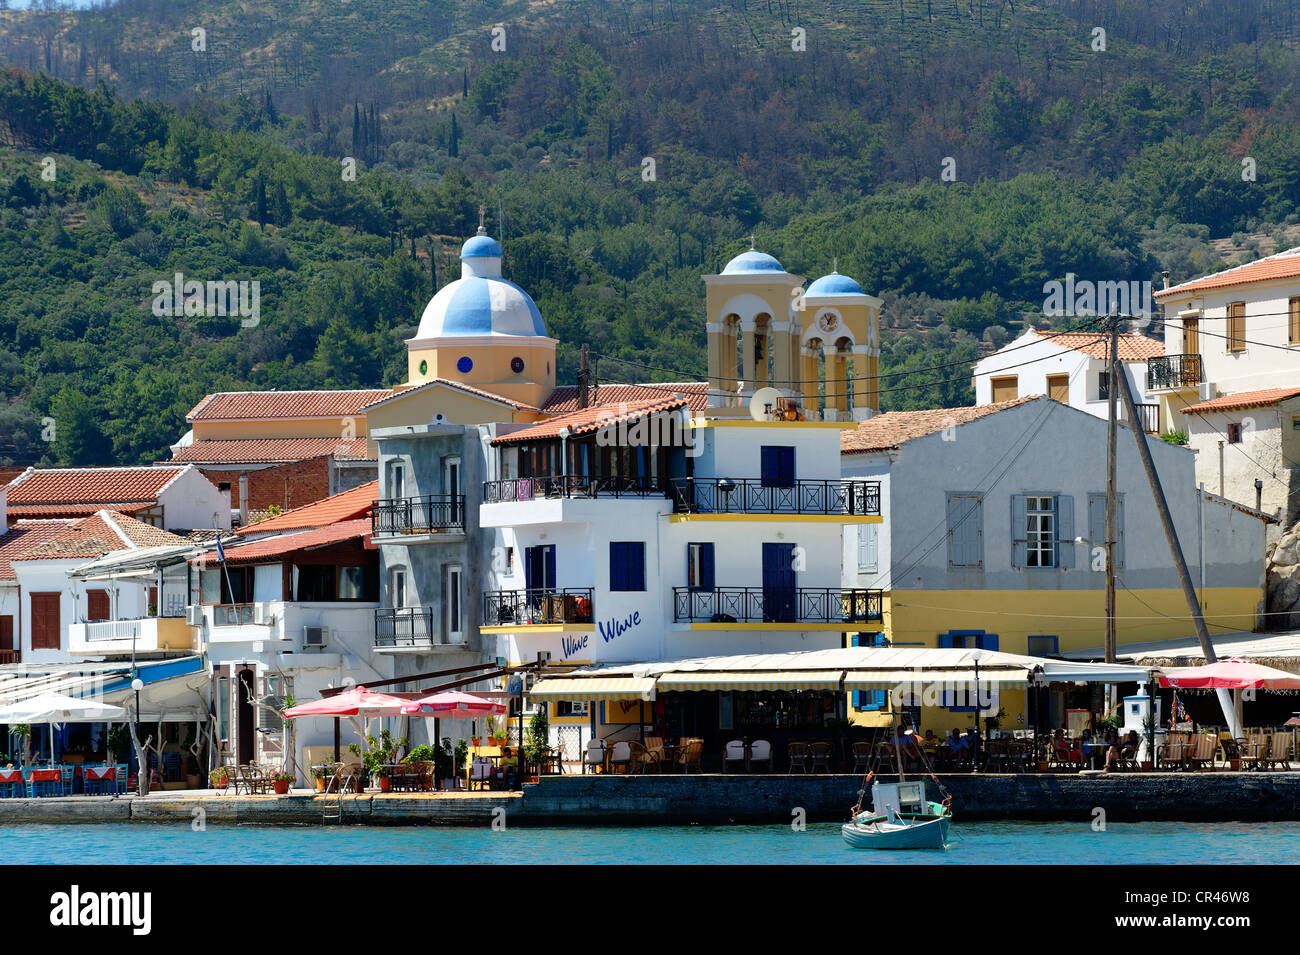 Harbour of Kokkari, with the church of Agios Nikolaos, Samos island, southern Sporades, Aegean sea, Greece, Europe - Stock Image